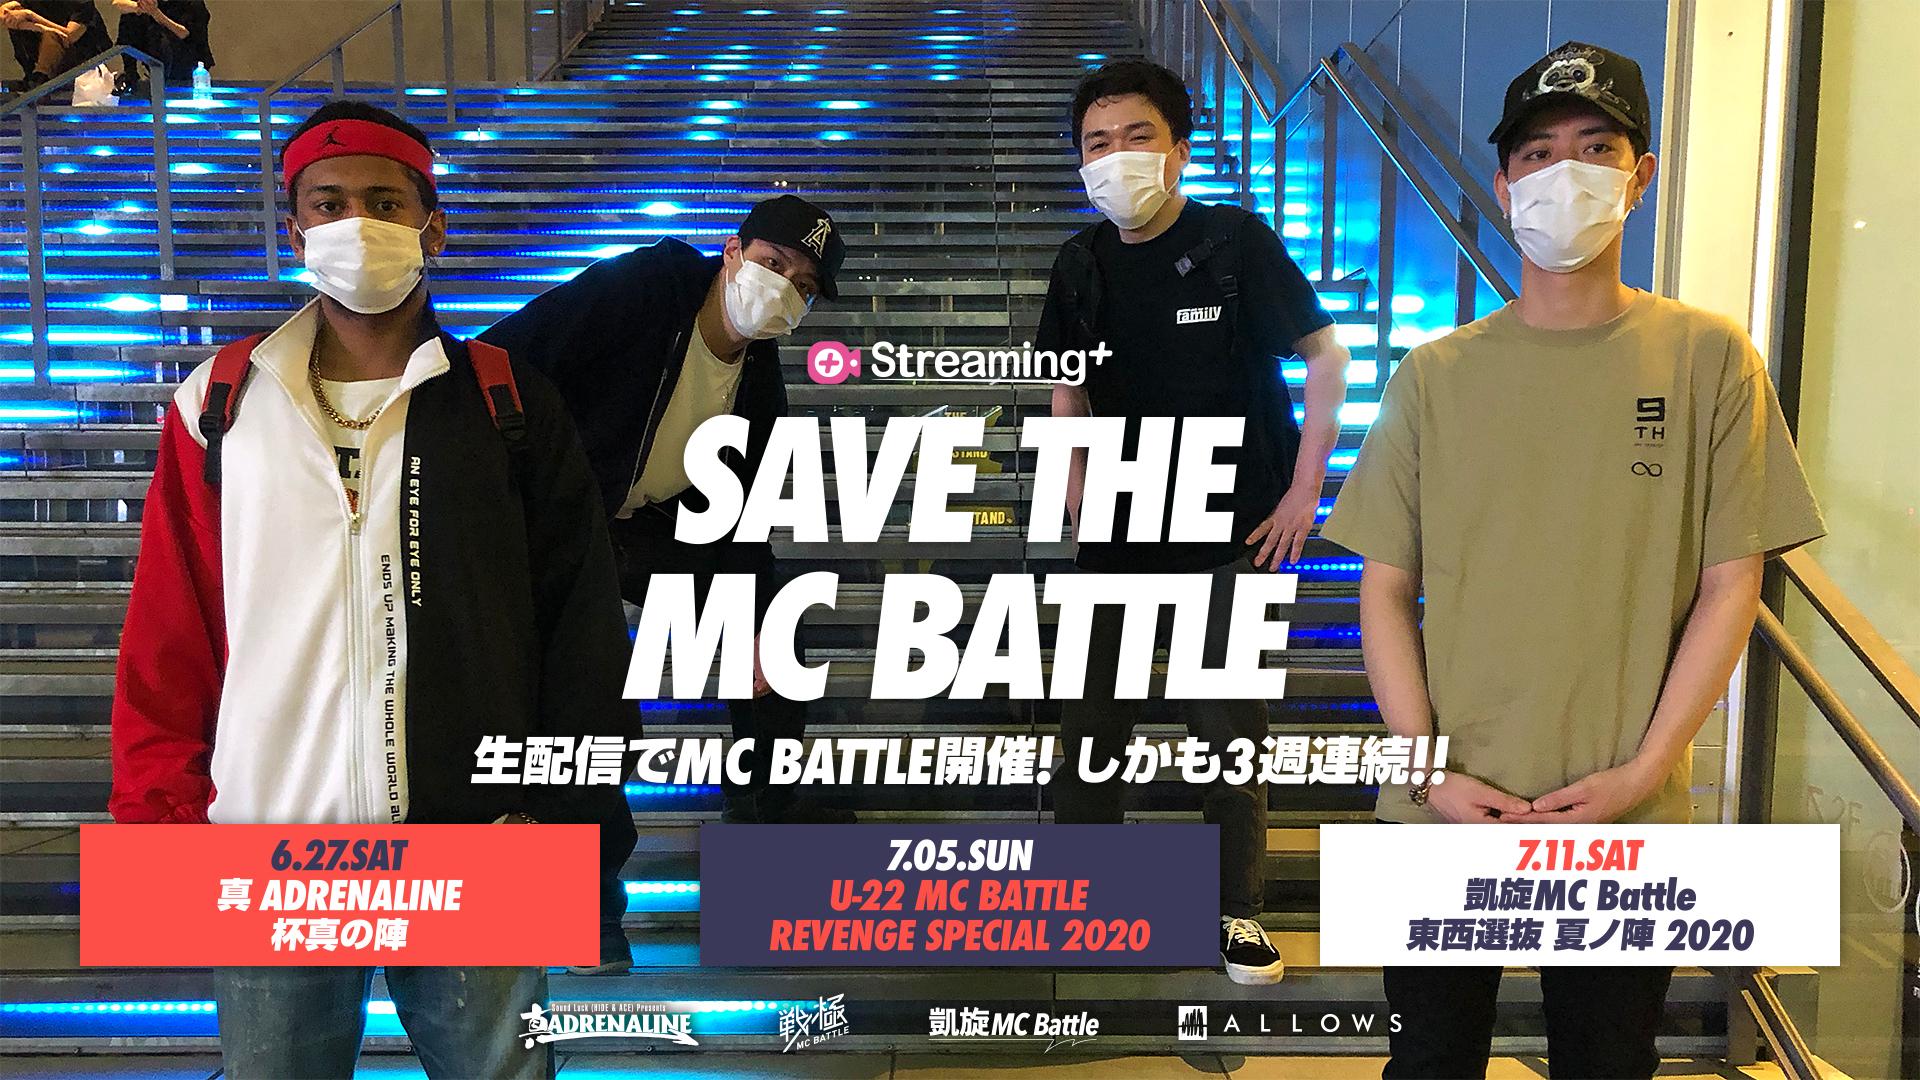 『SAVE THE MC BATTLE』